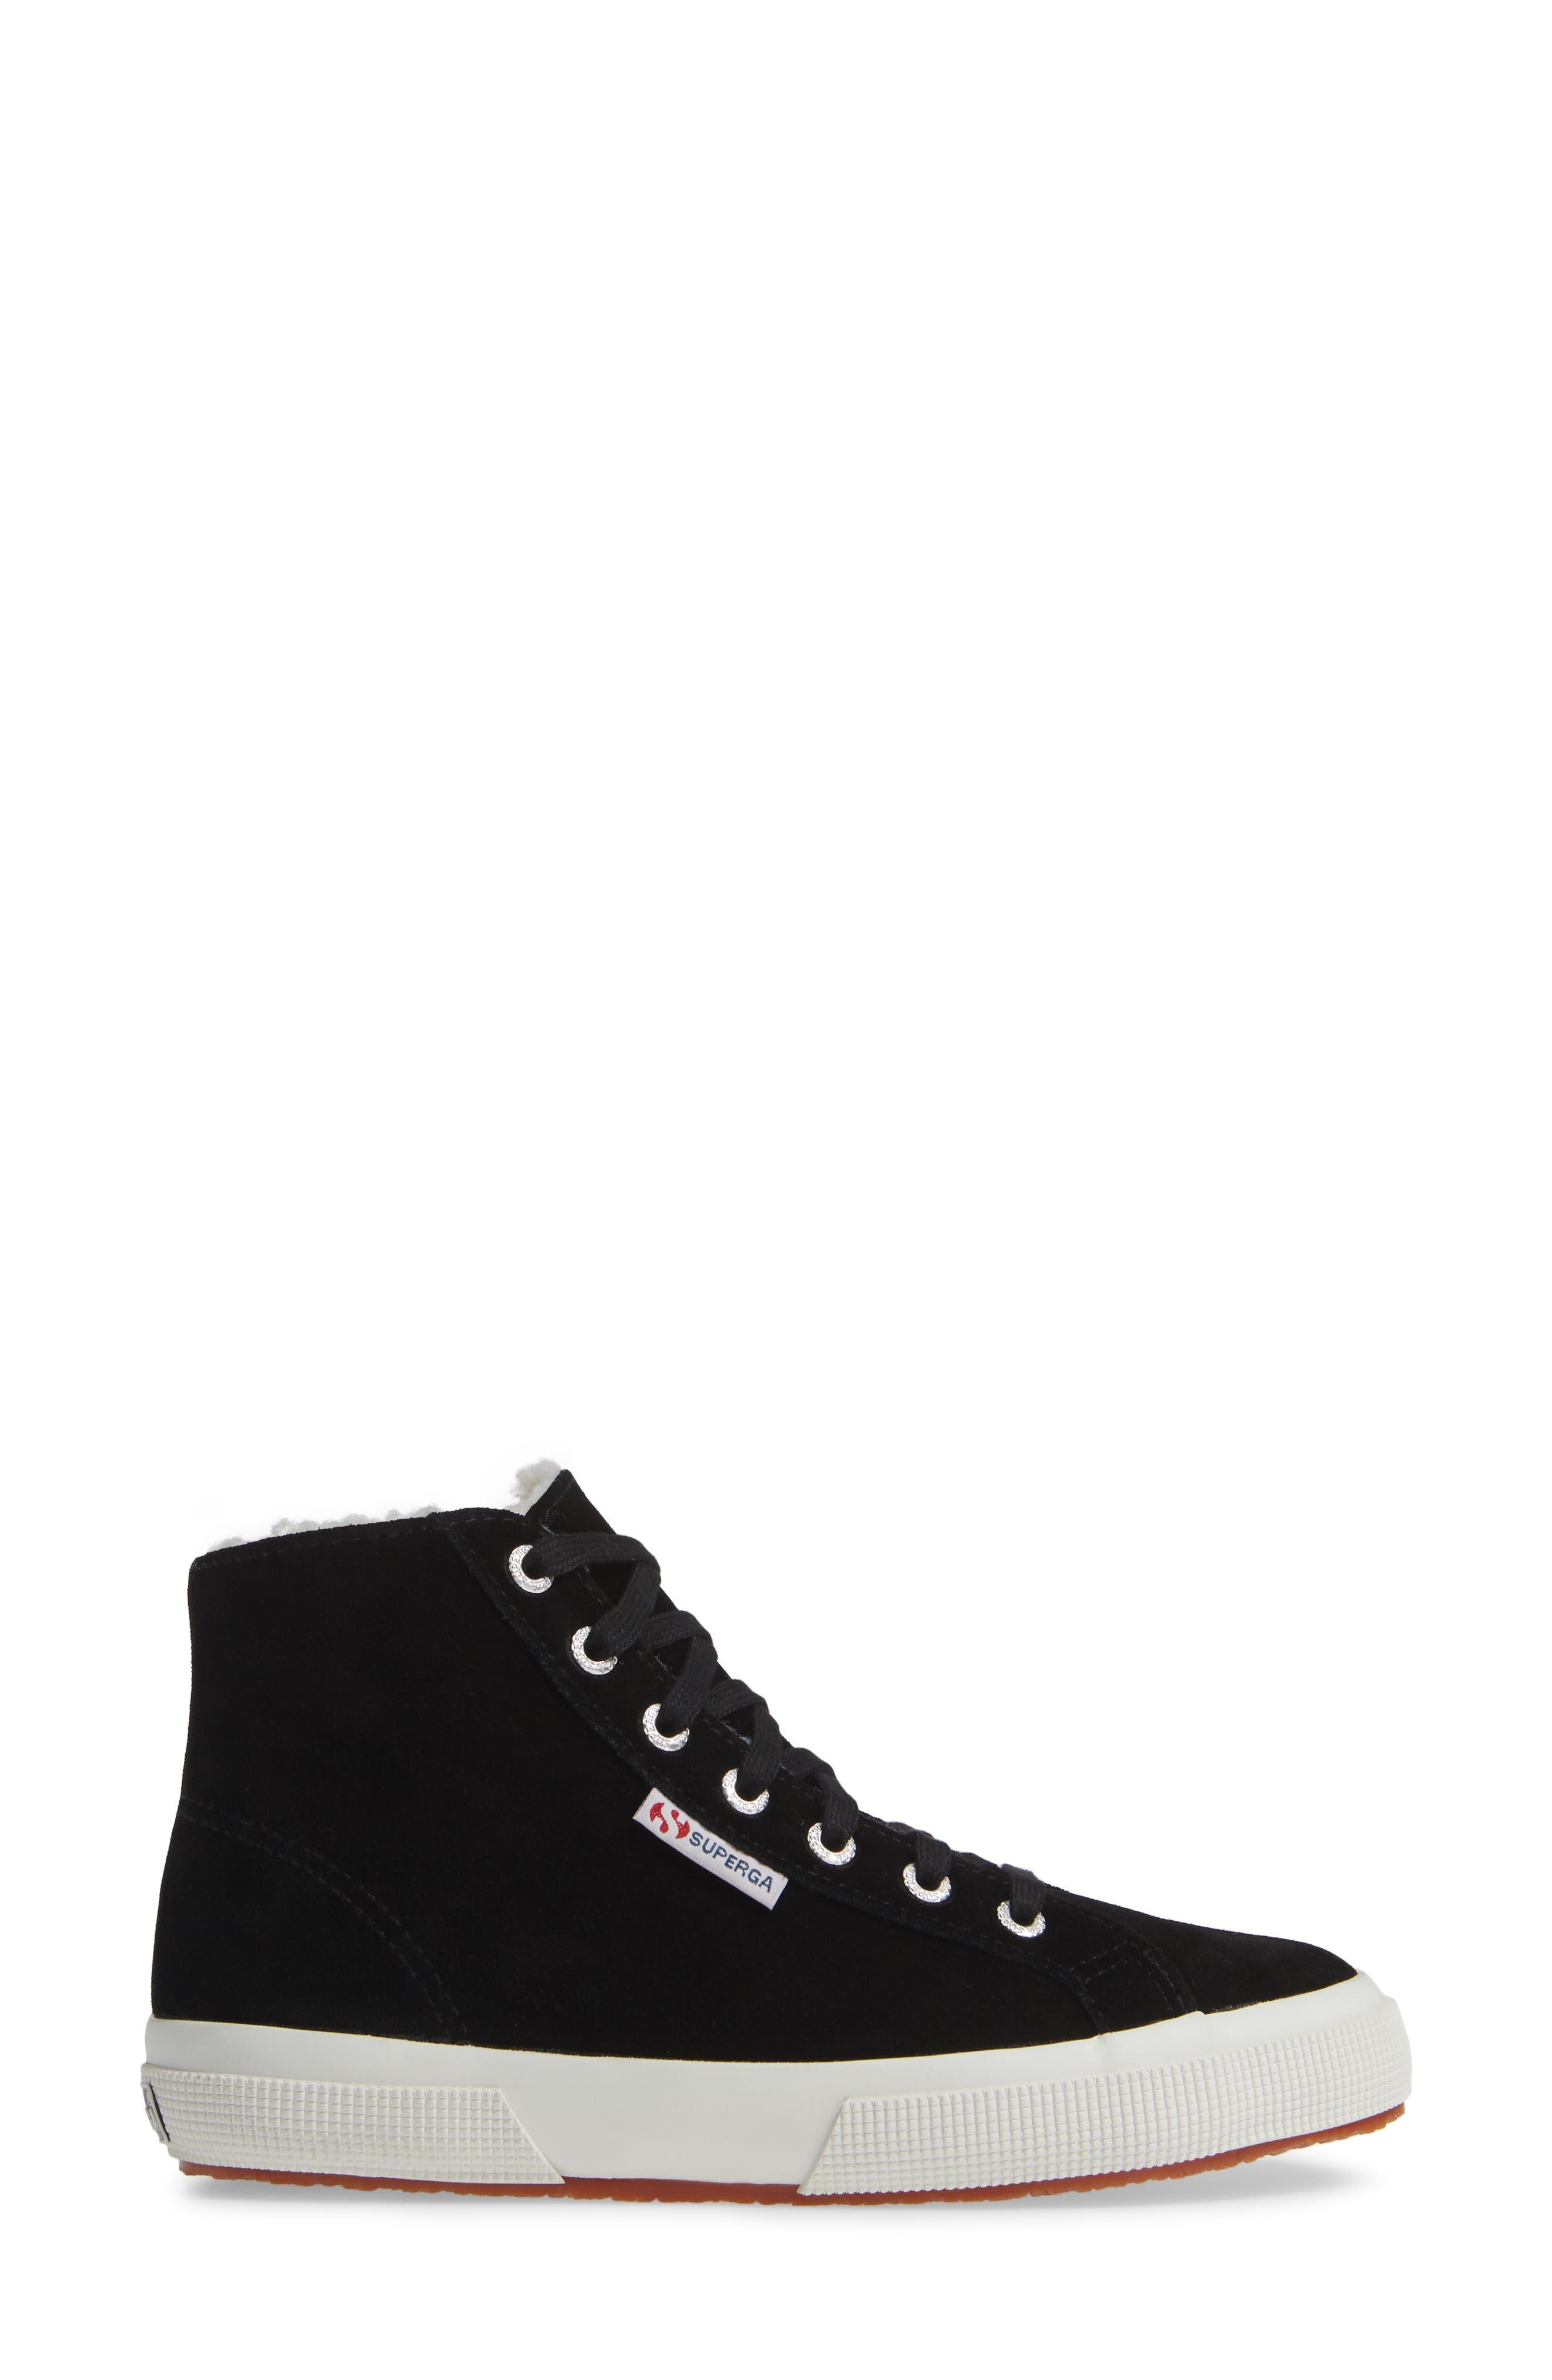 2795 Suefurw High Top Sneaker,                             Alternate thumbnail 3, color,                             BLACK SUEDE